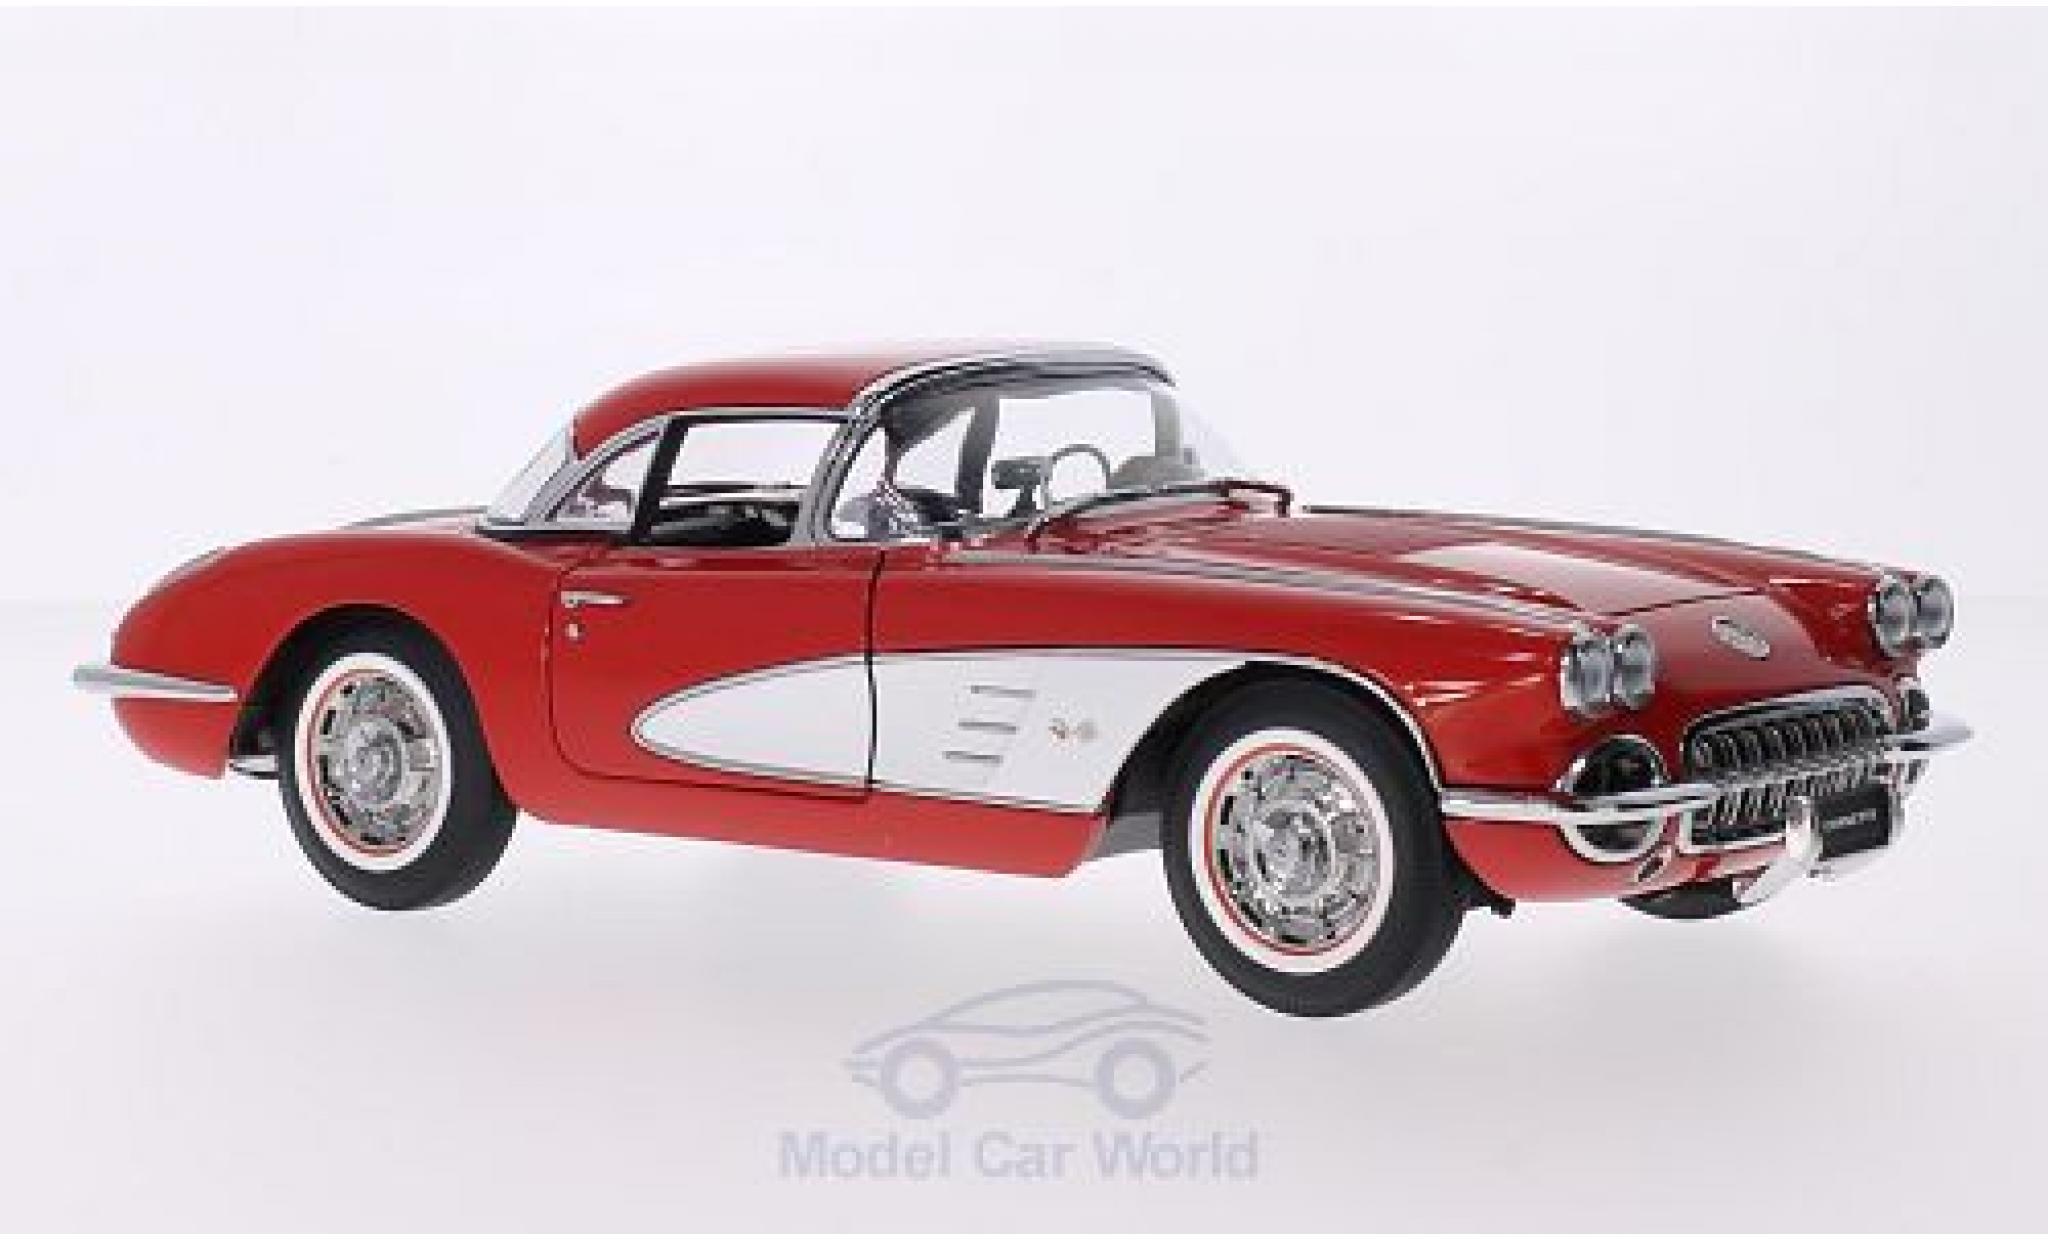 Chevrolet Corvette C1 1/18 AUTOart  red/white 1958 Hardtop liegt bei